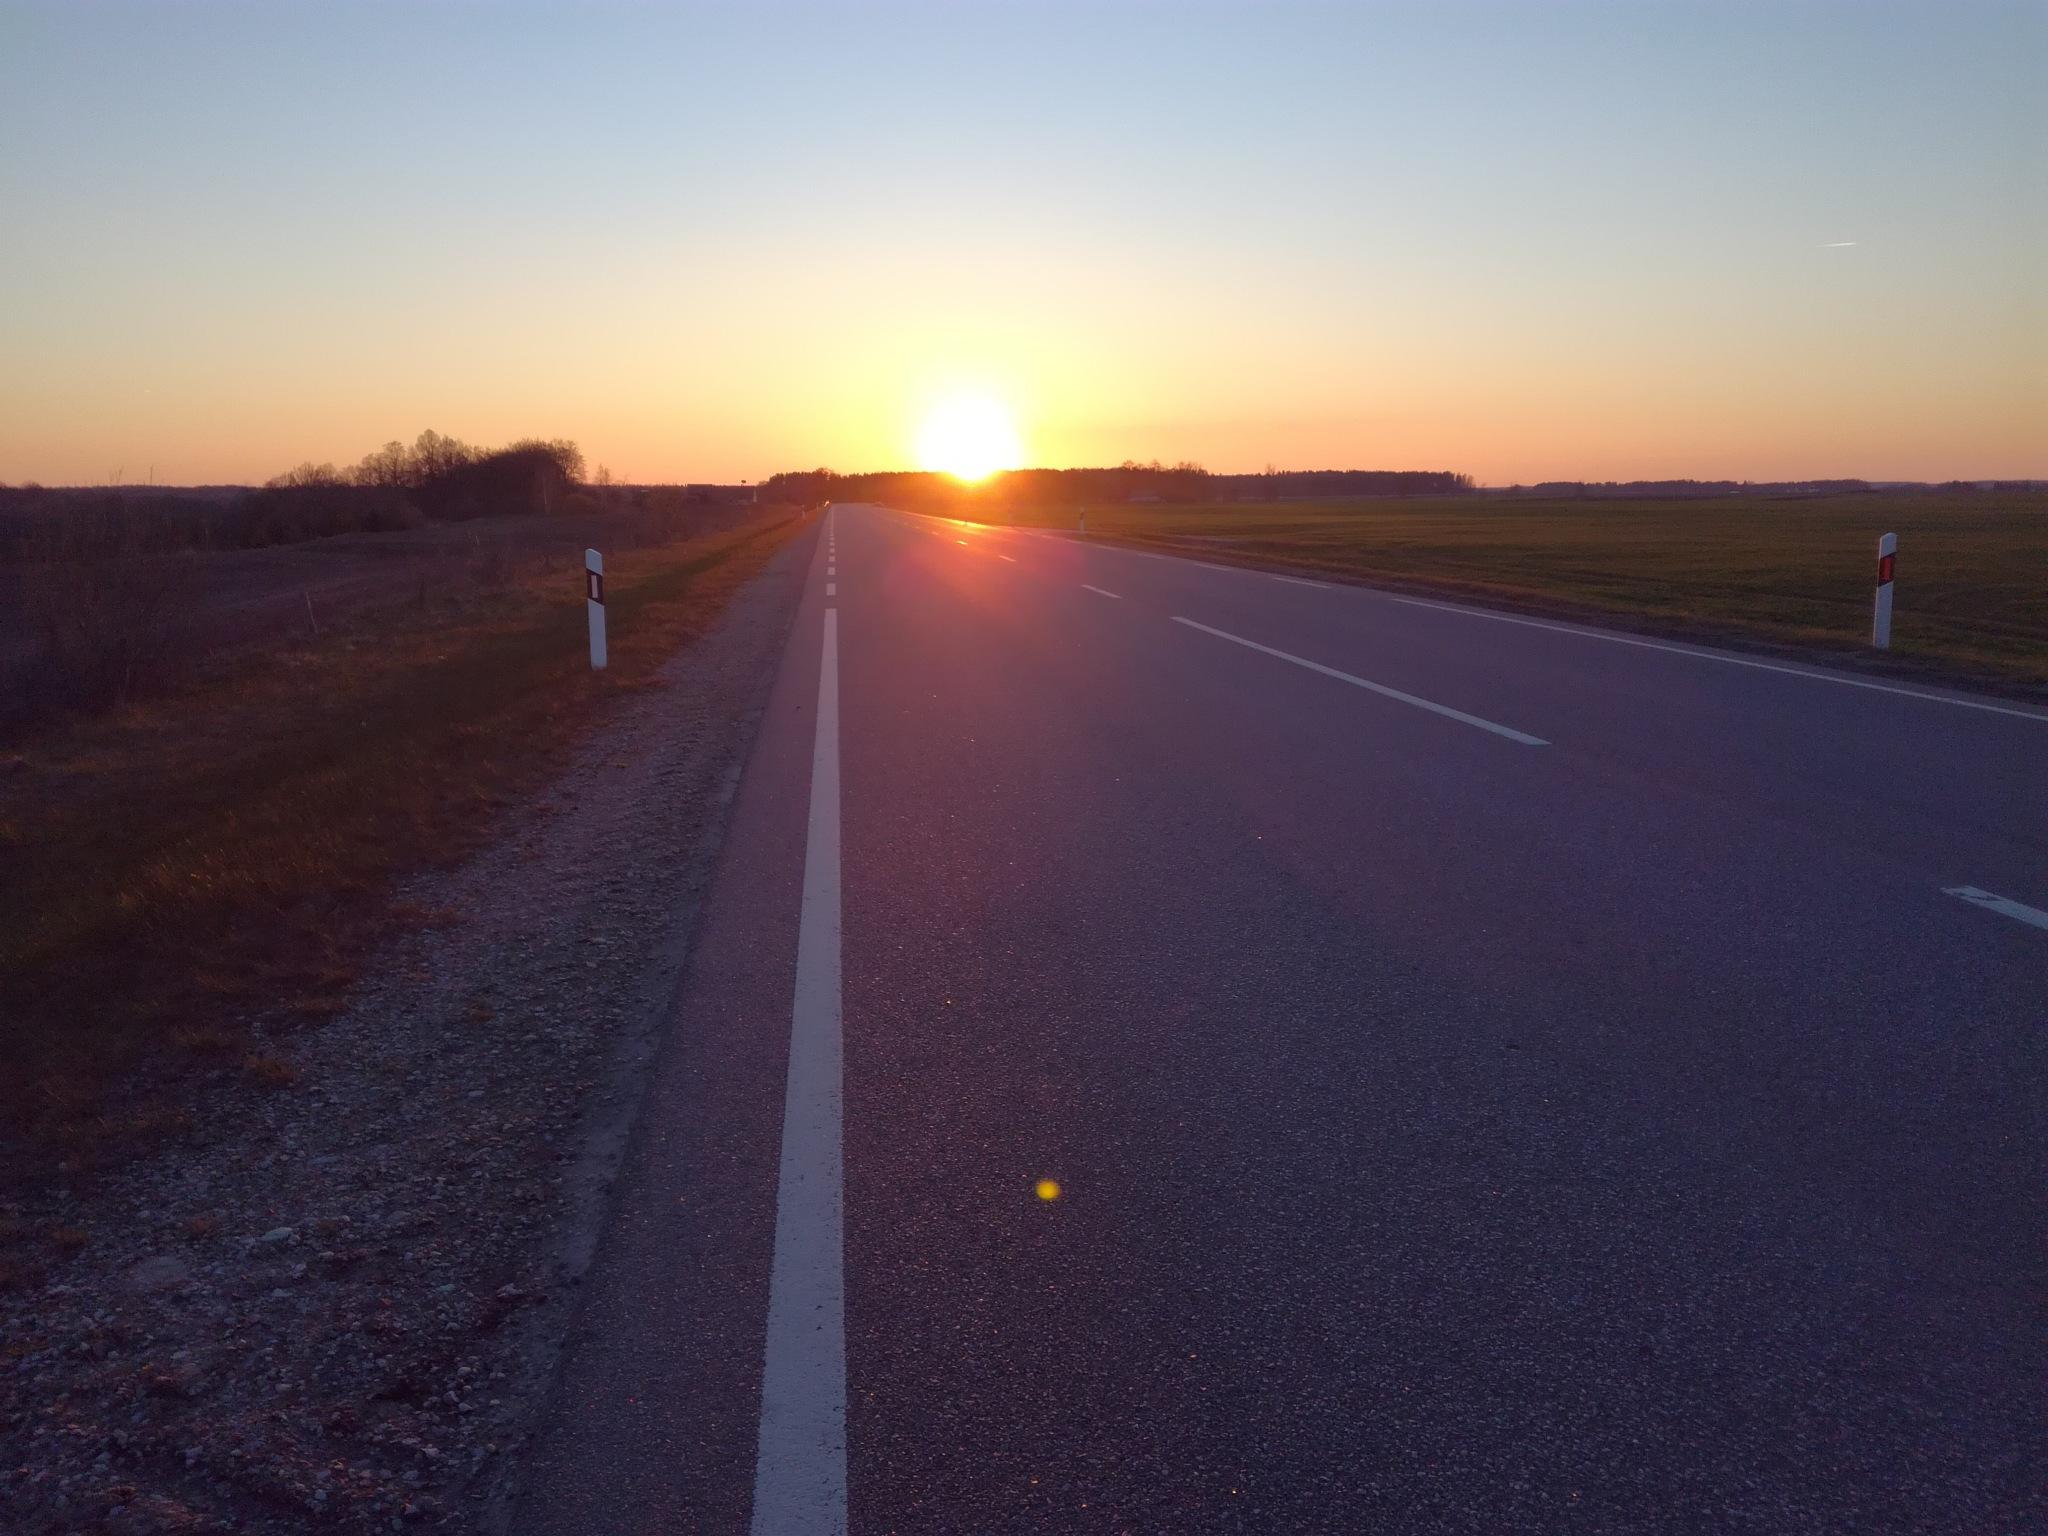 Sunset by uzkuraitiene62